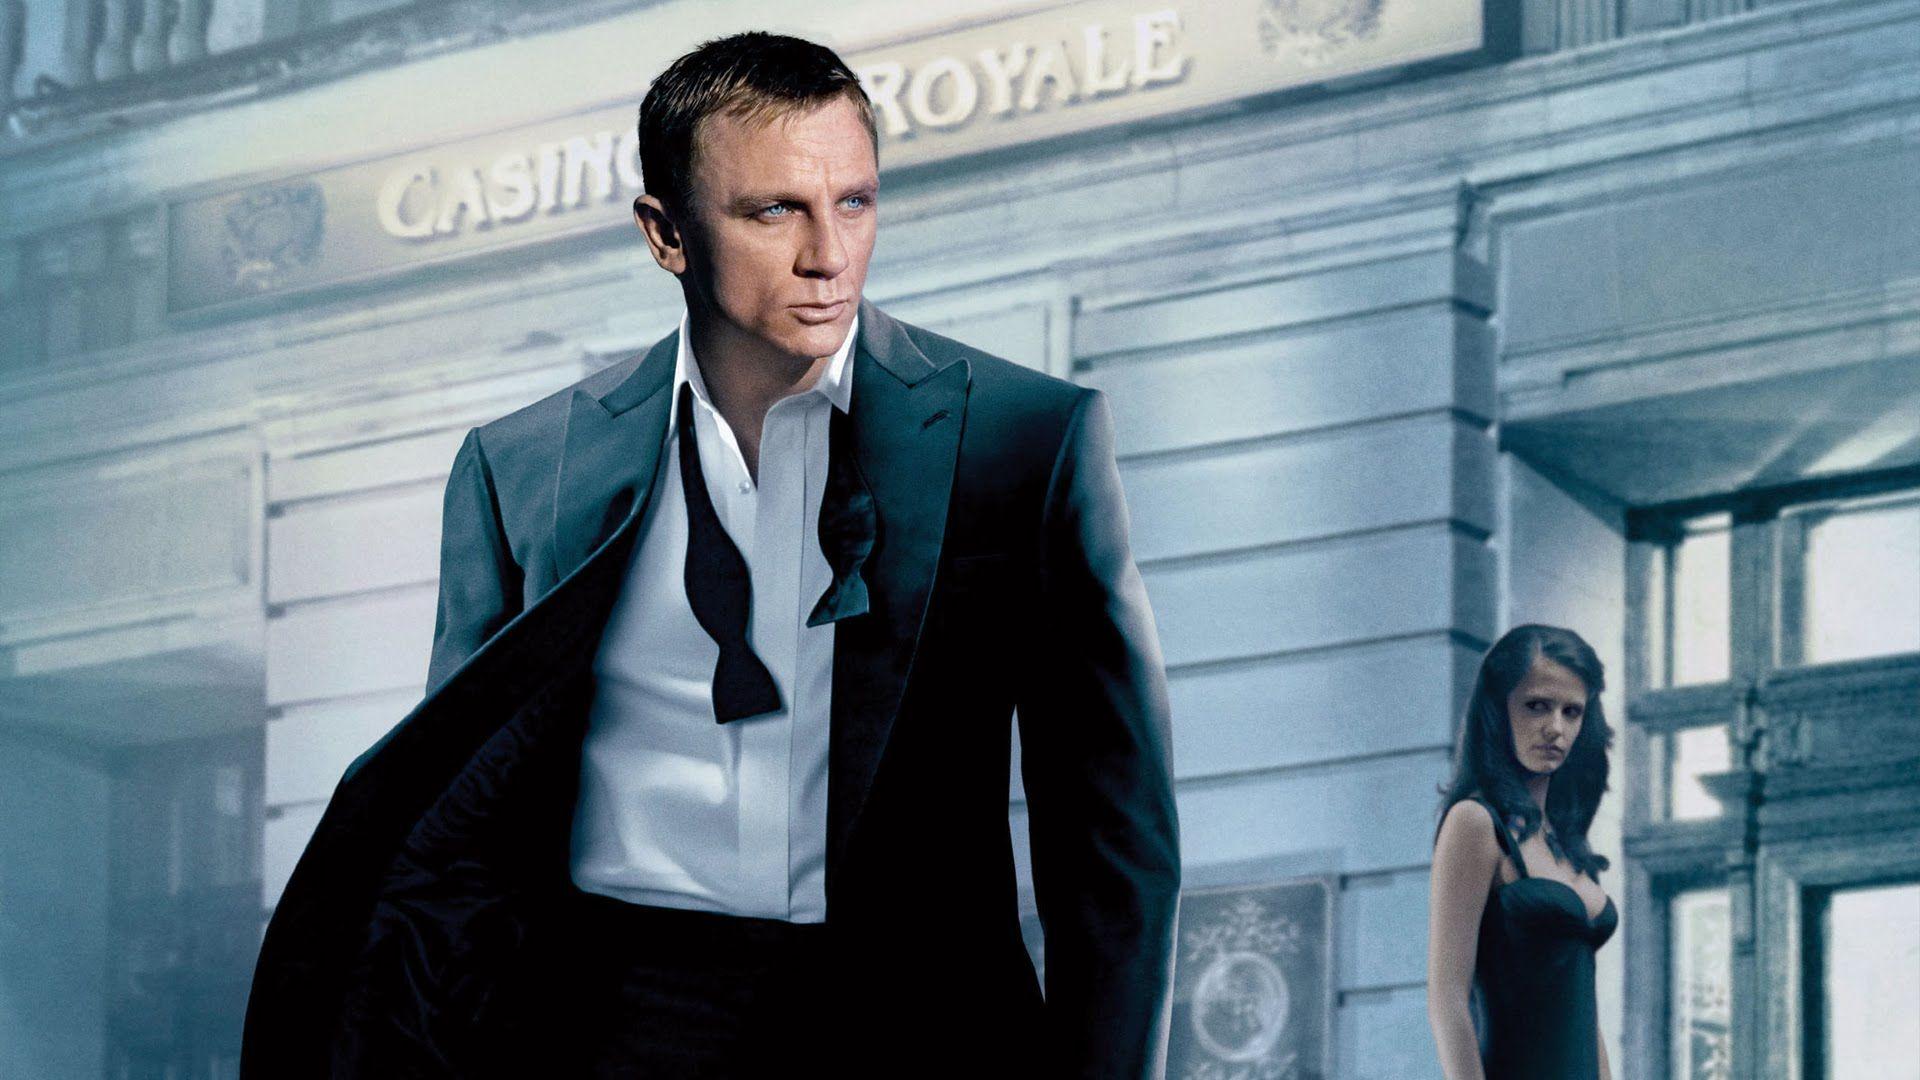 Youtube Cassino Royale Cassino 007 Cassino Royale